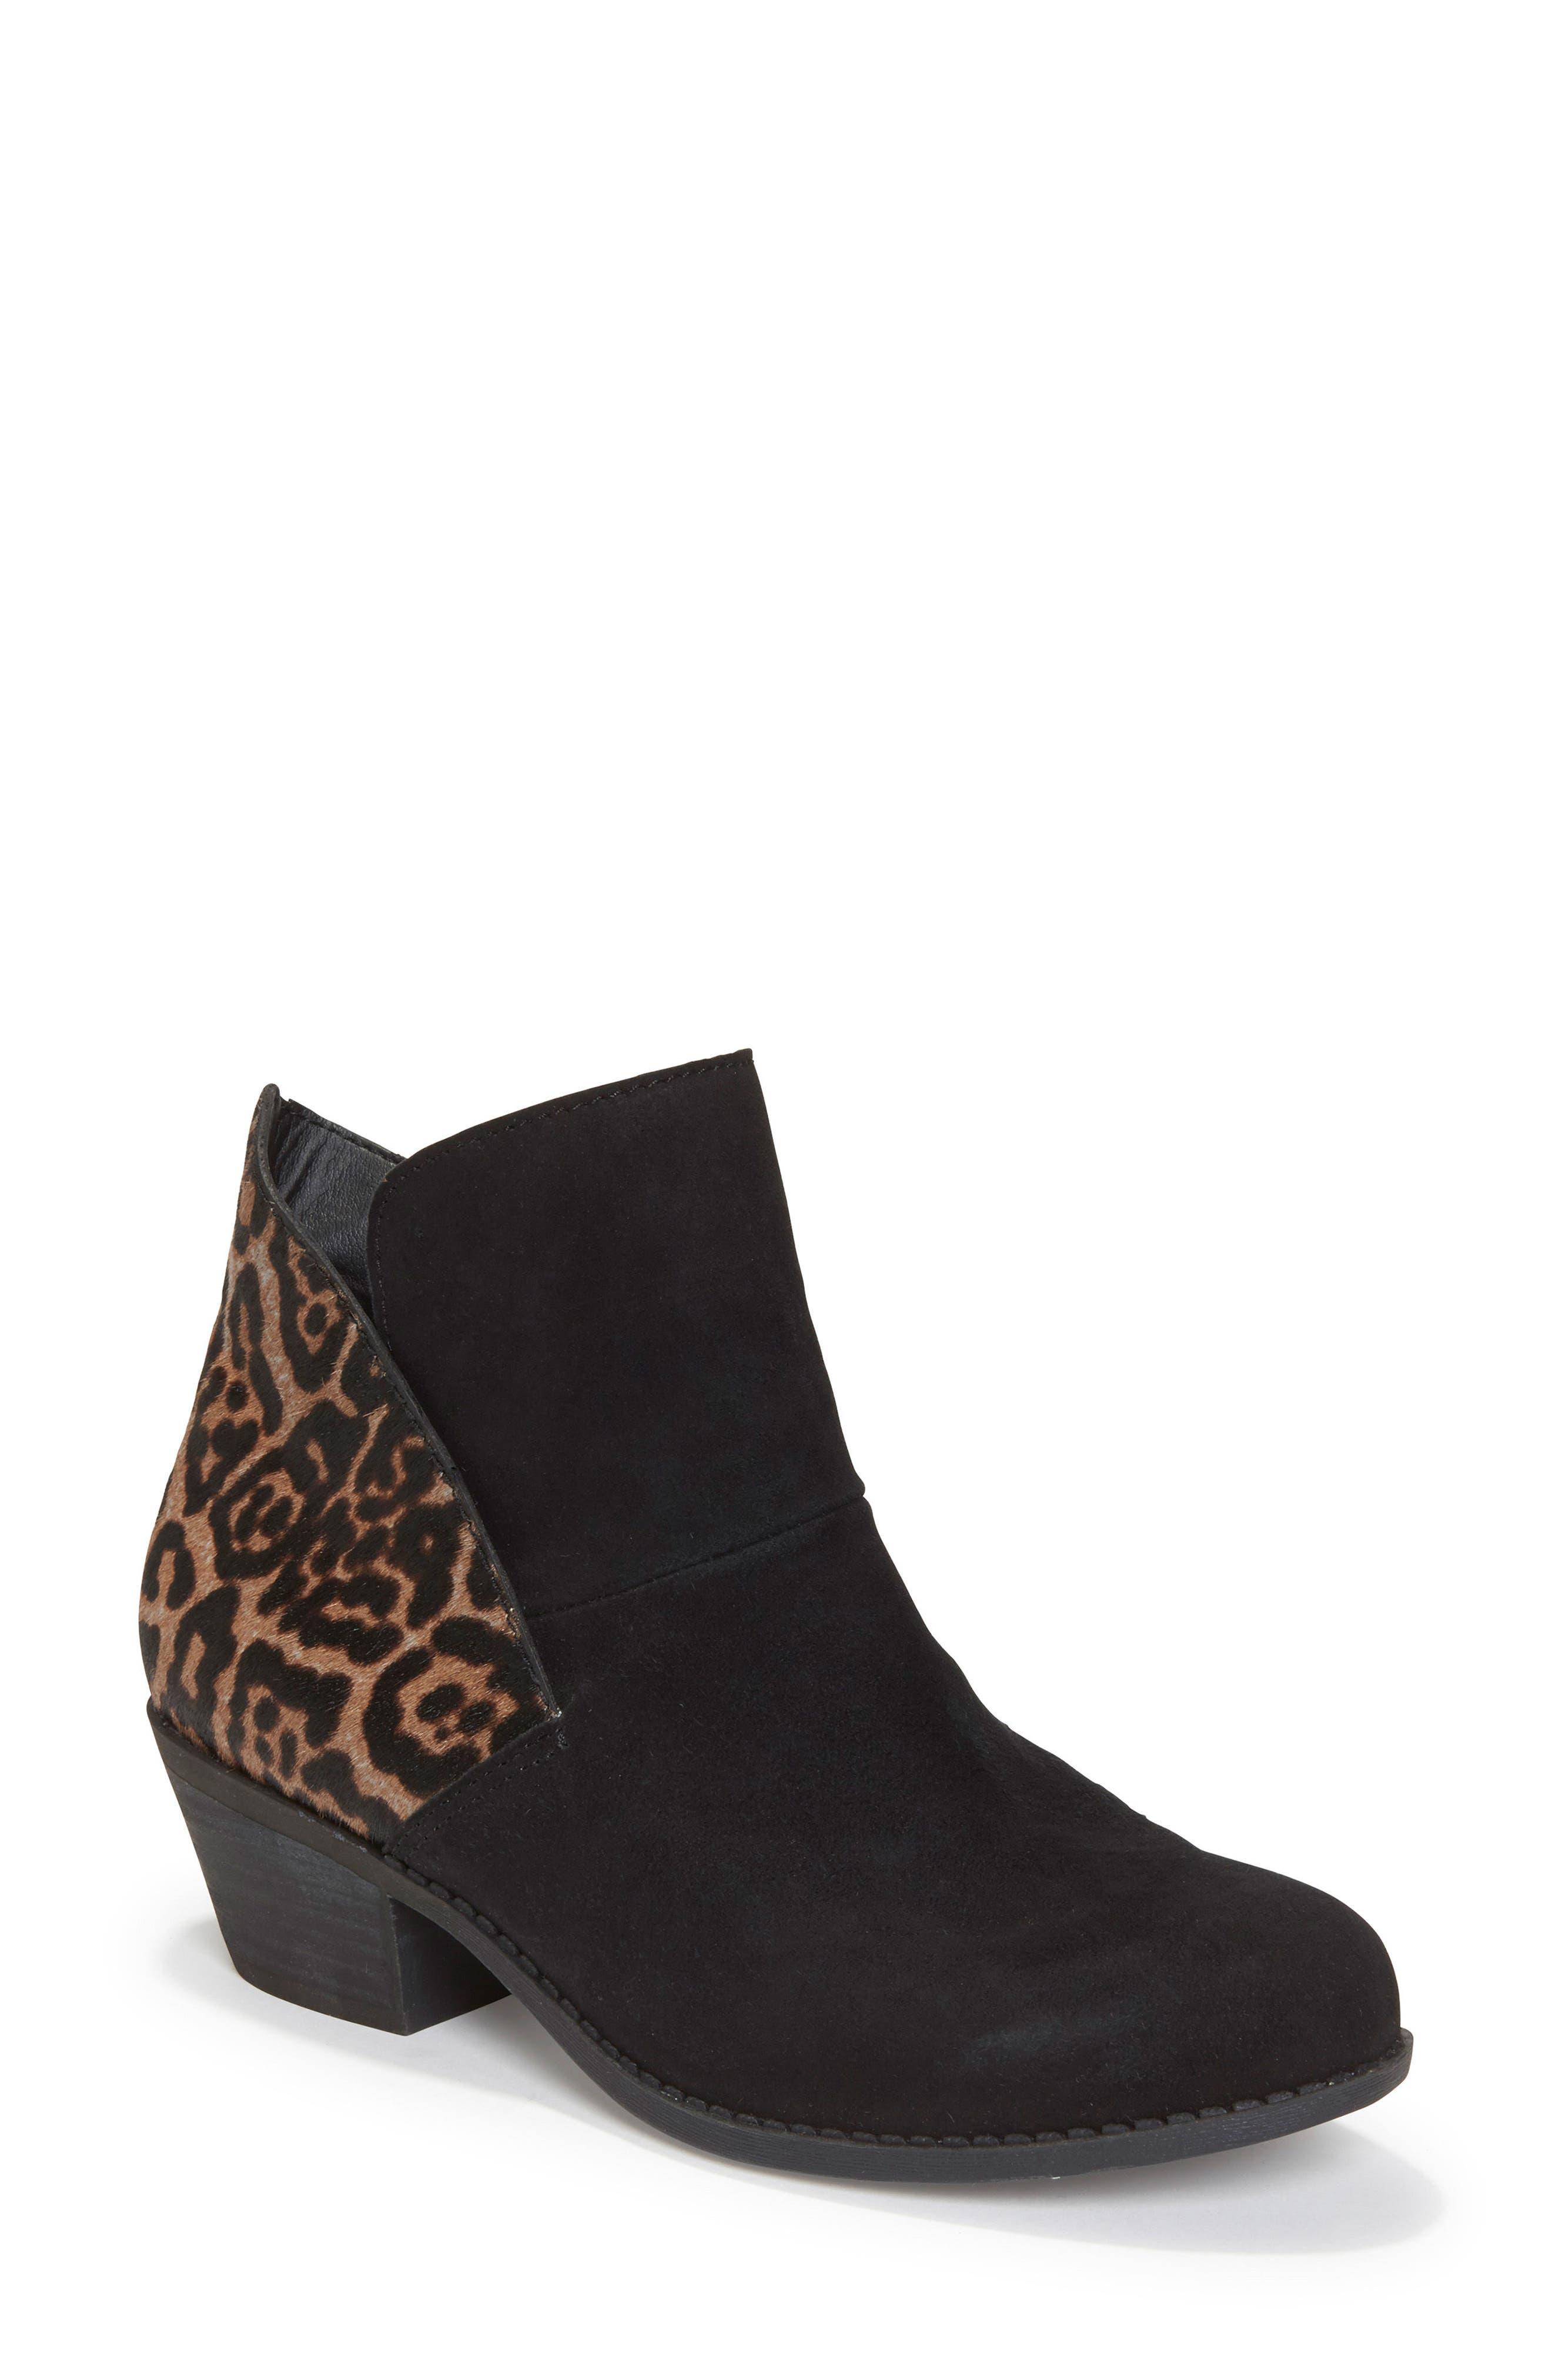 Main Image - Me Too Zena Ankle Boot (Women)